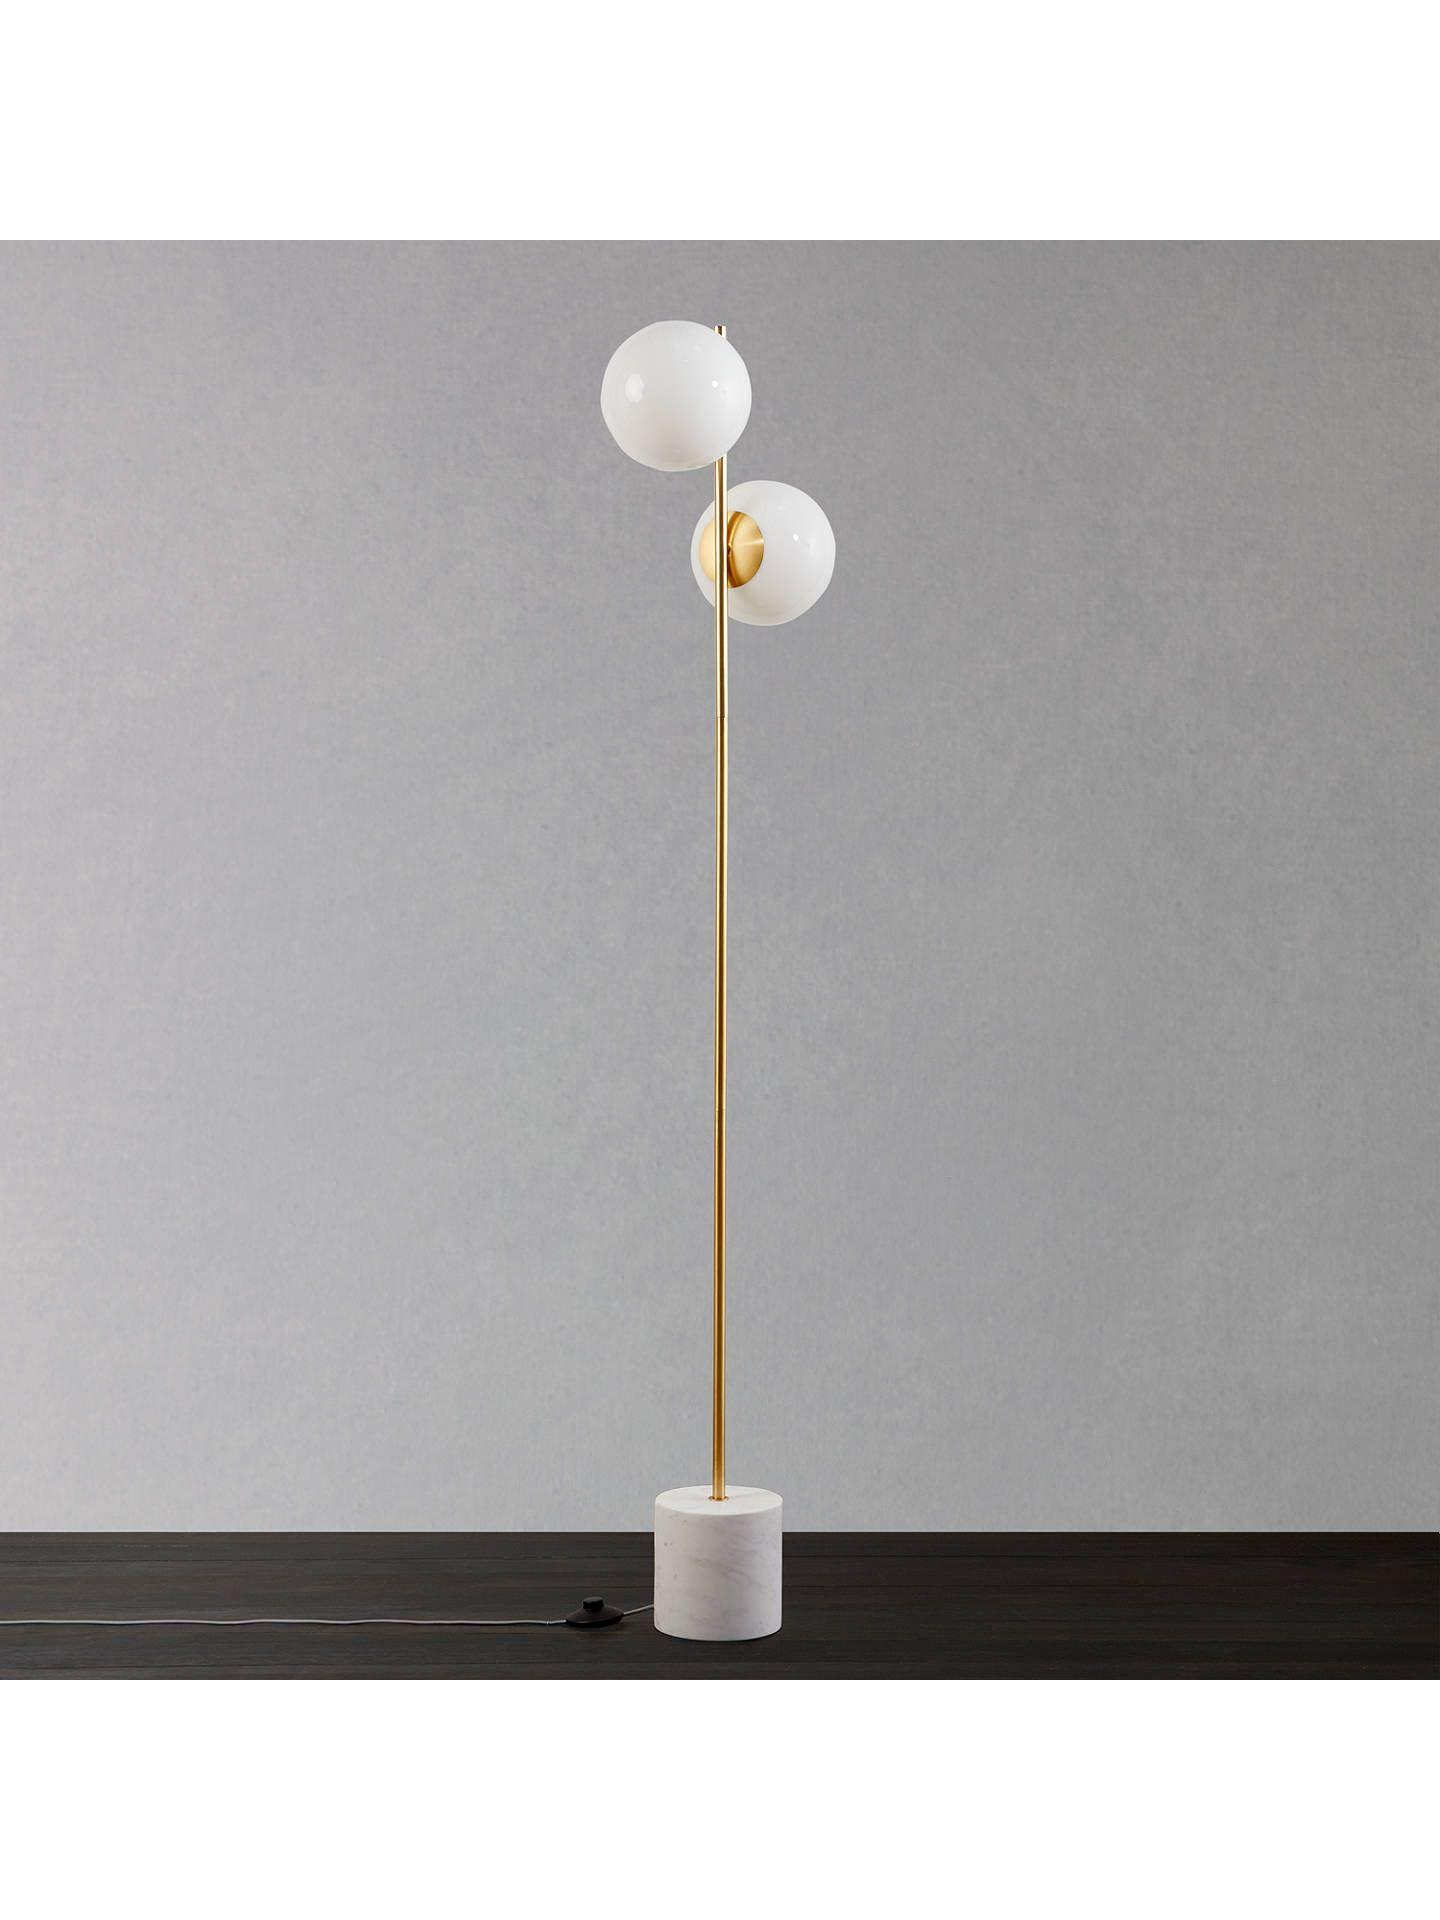 Sphere + Stem Table Lamp | Table lamp